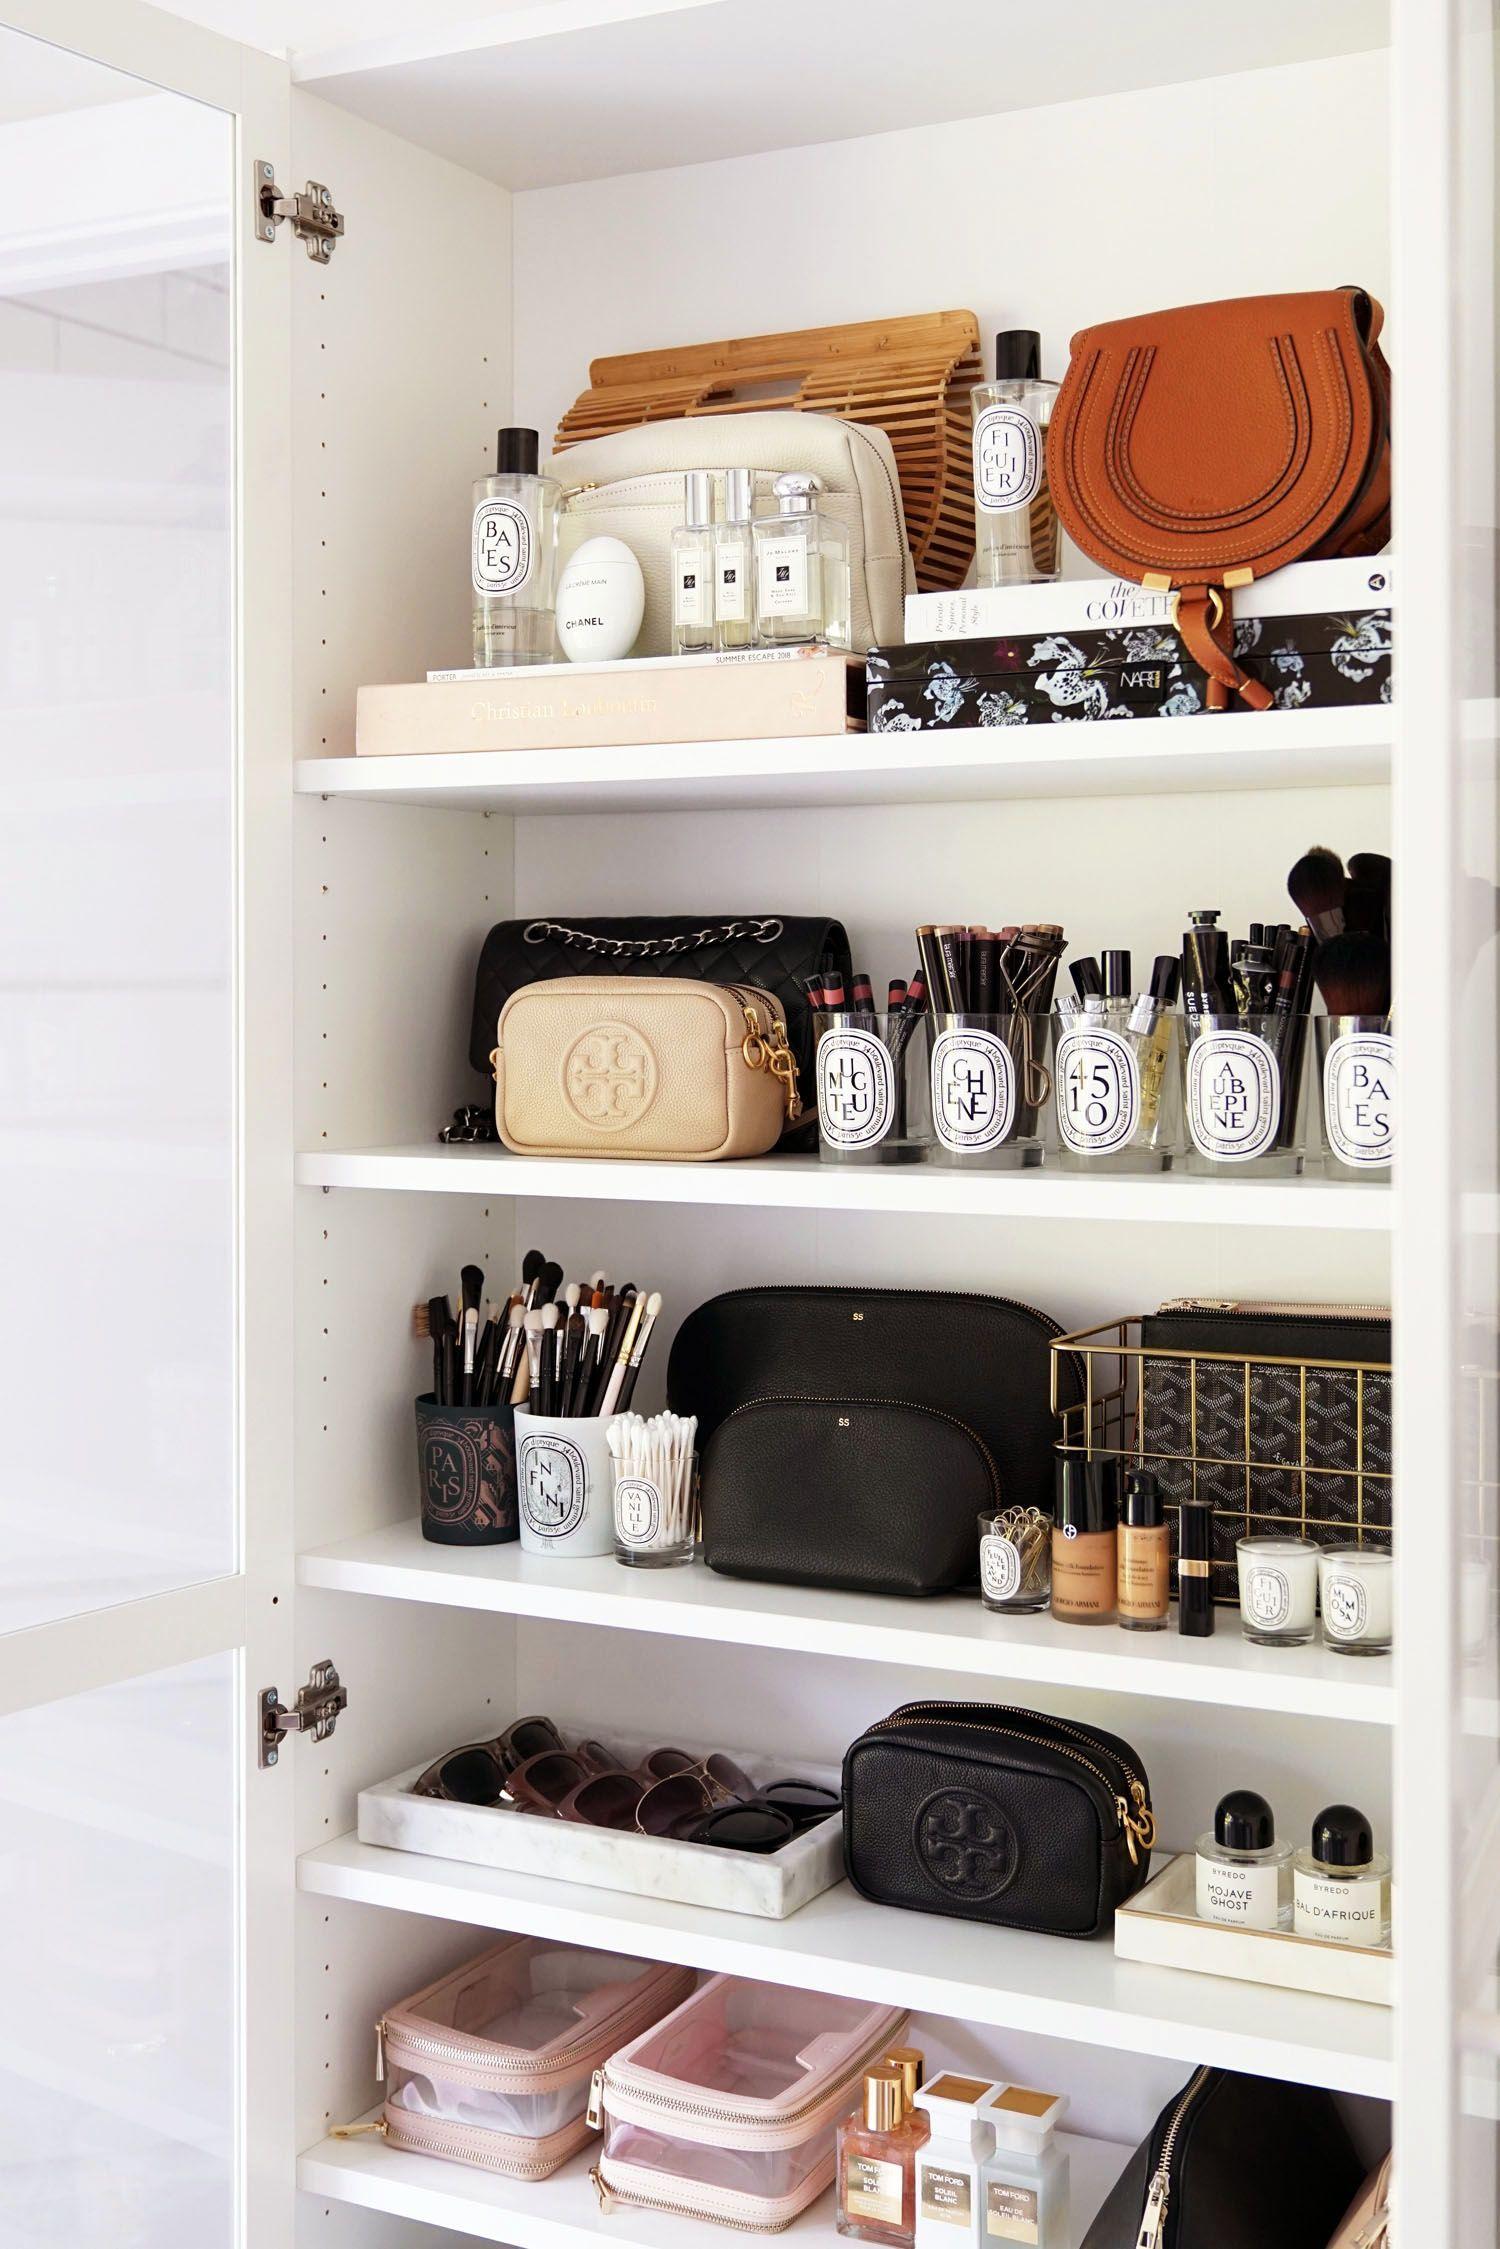 Diy Fall Home Decor Cleaning Faqs Recycling Diptyque Jars Favorite Brush Cleansers Clear Bag In 2020 Badezimmer Schrank Organisation Diy Mobel Design Dekor Zimmer